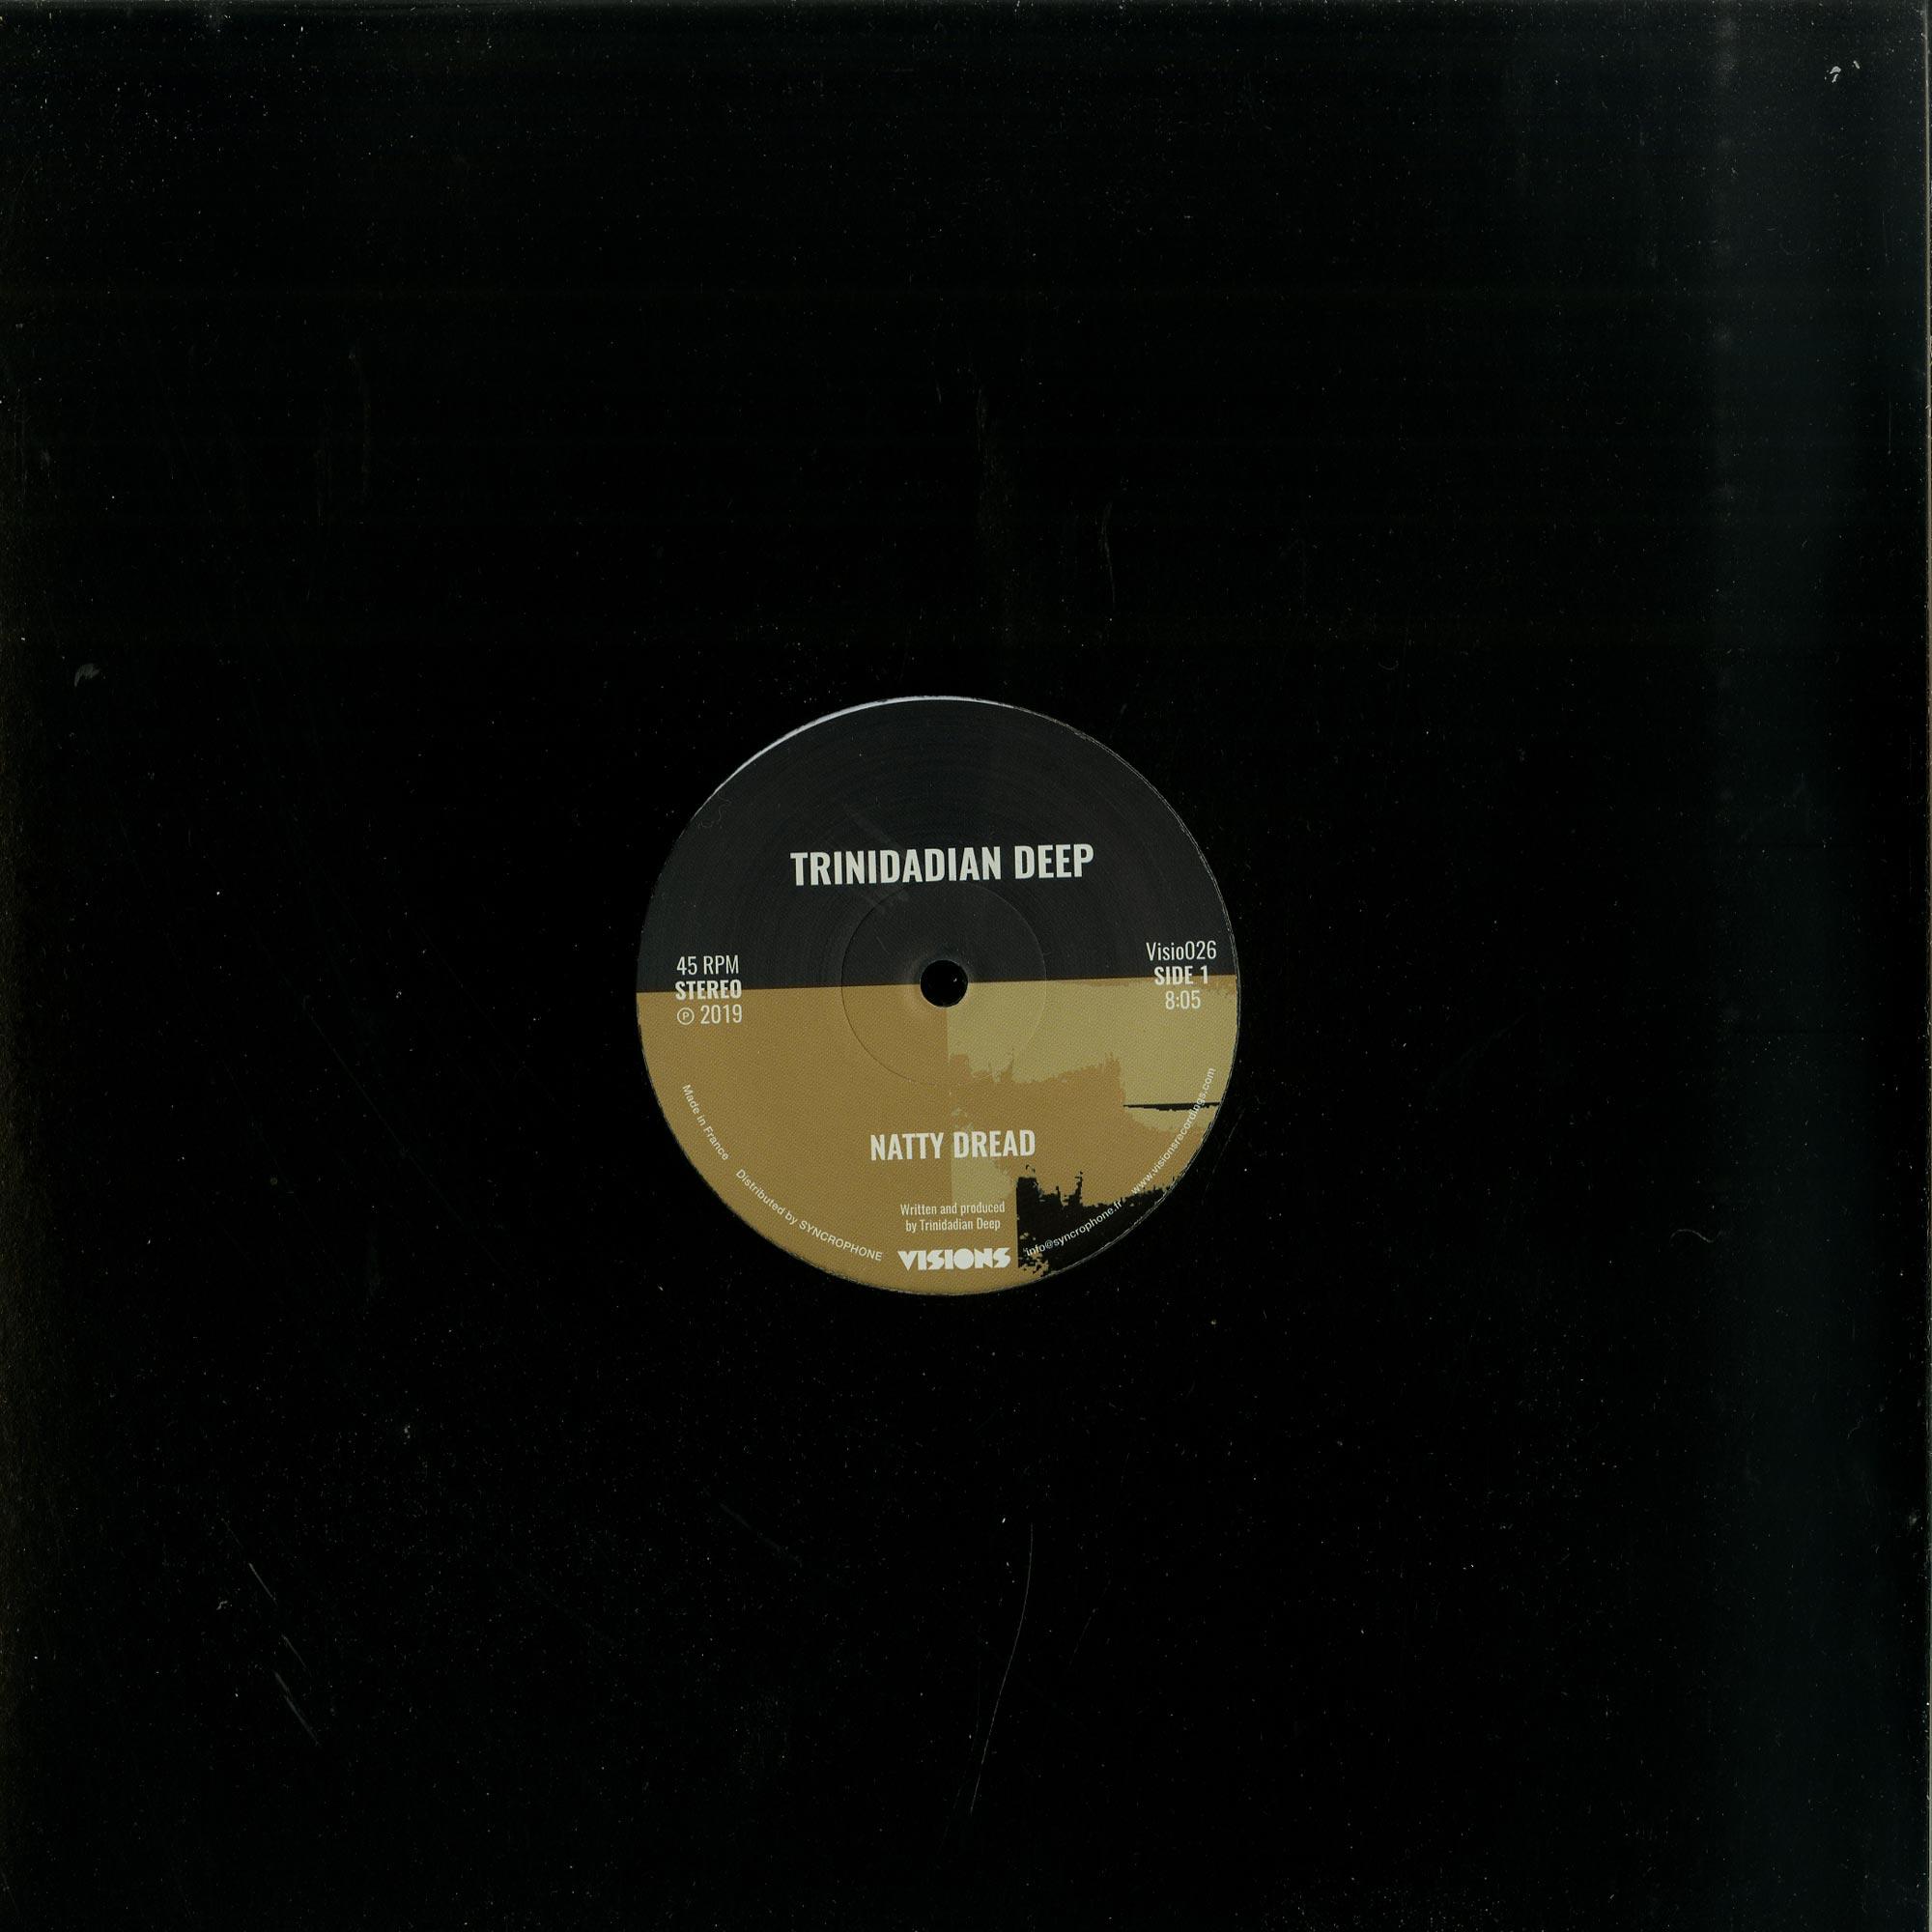 Trinidadian Deep - EP